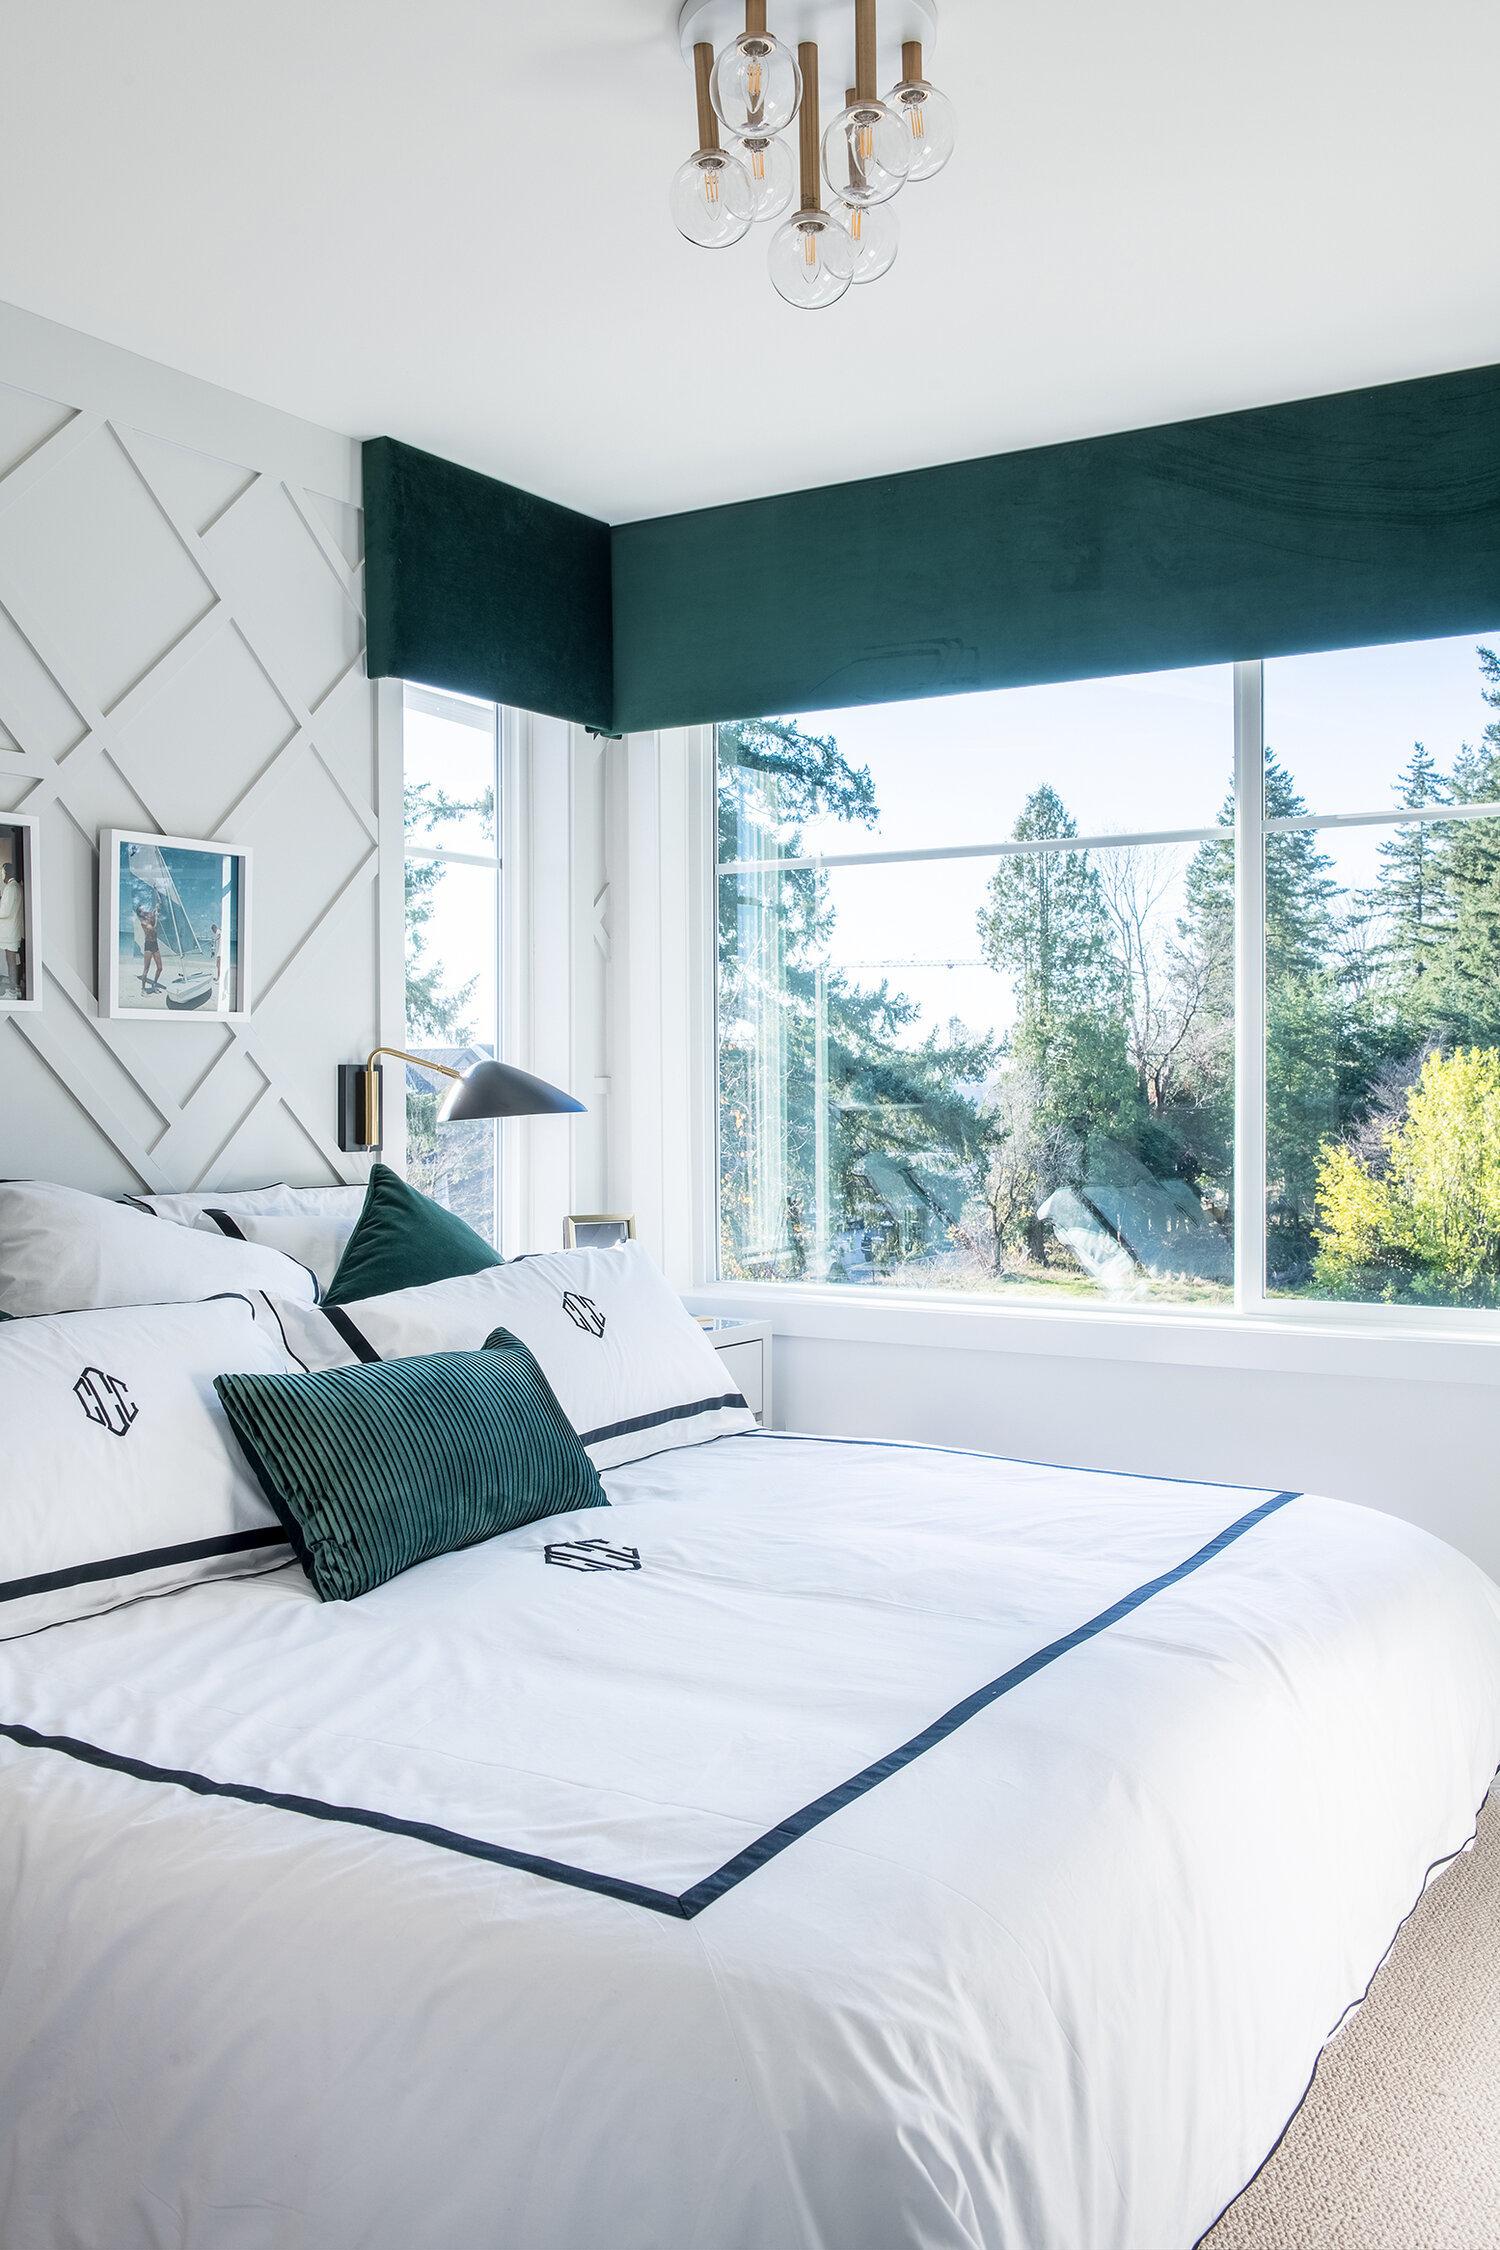 Bedroom - 2328 167A St, Surrey, BC V3Z 1H2, Canada!